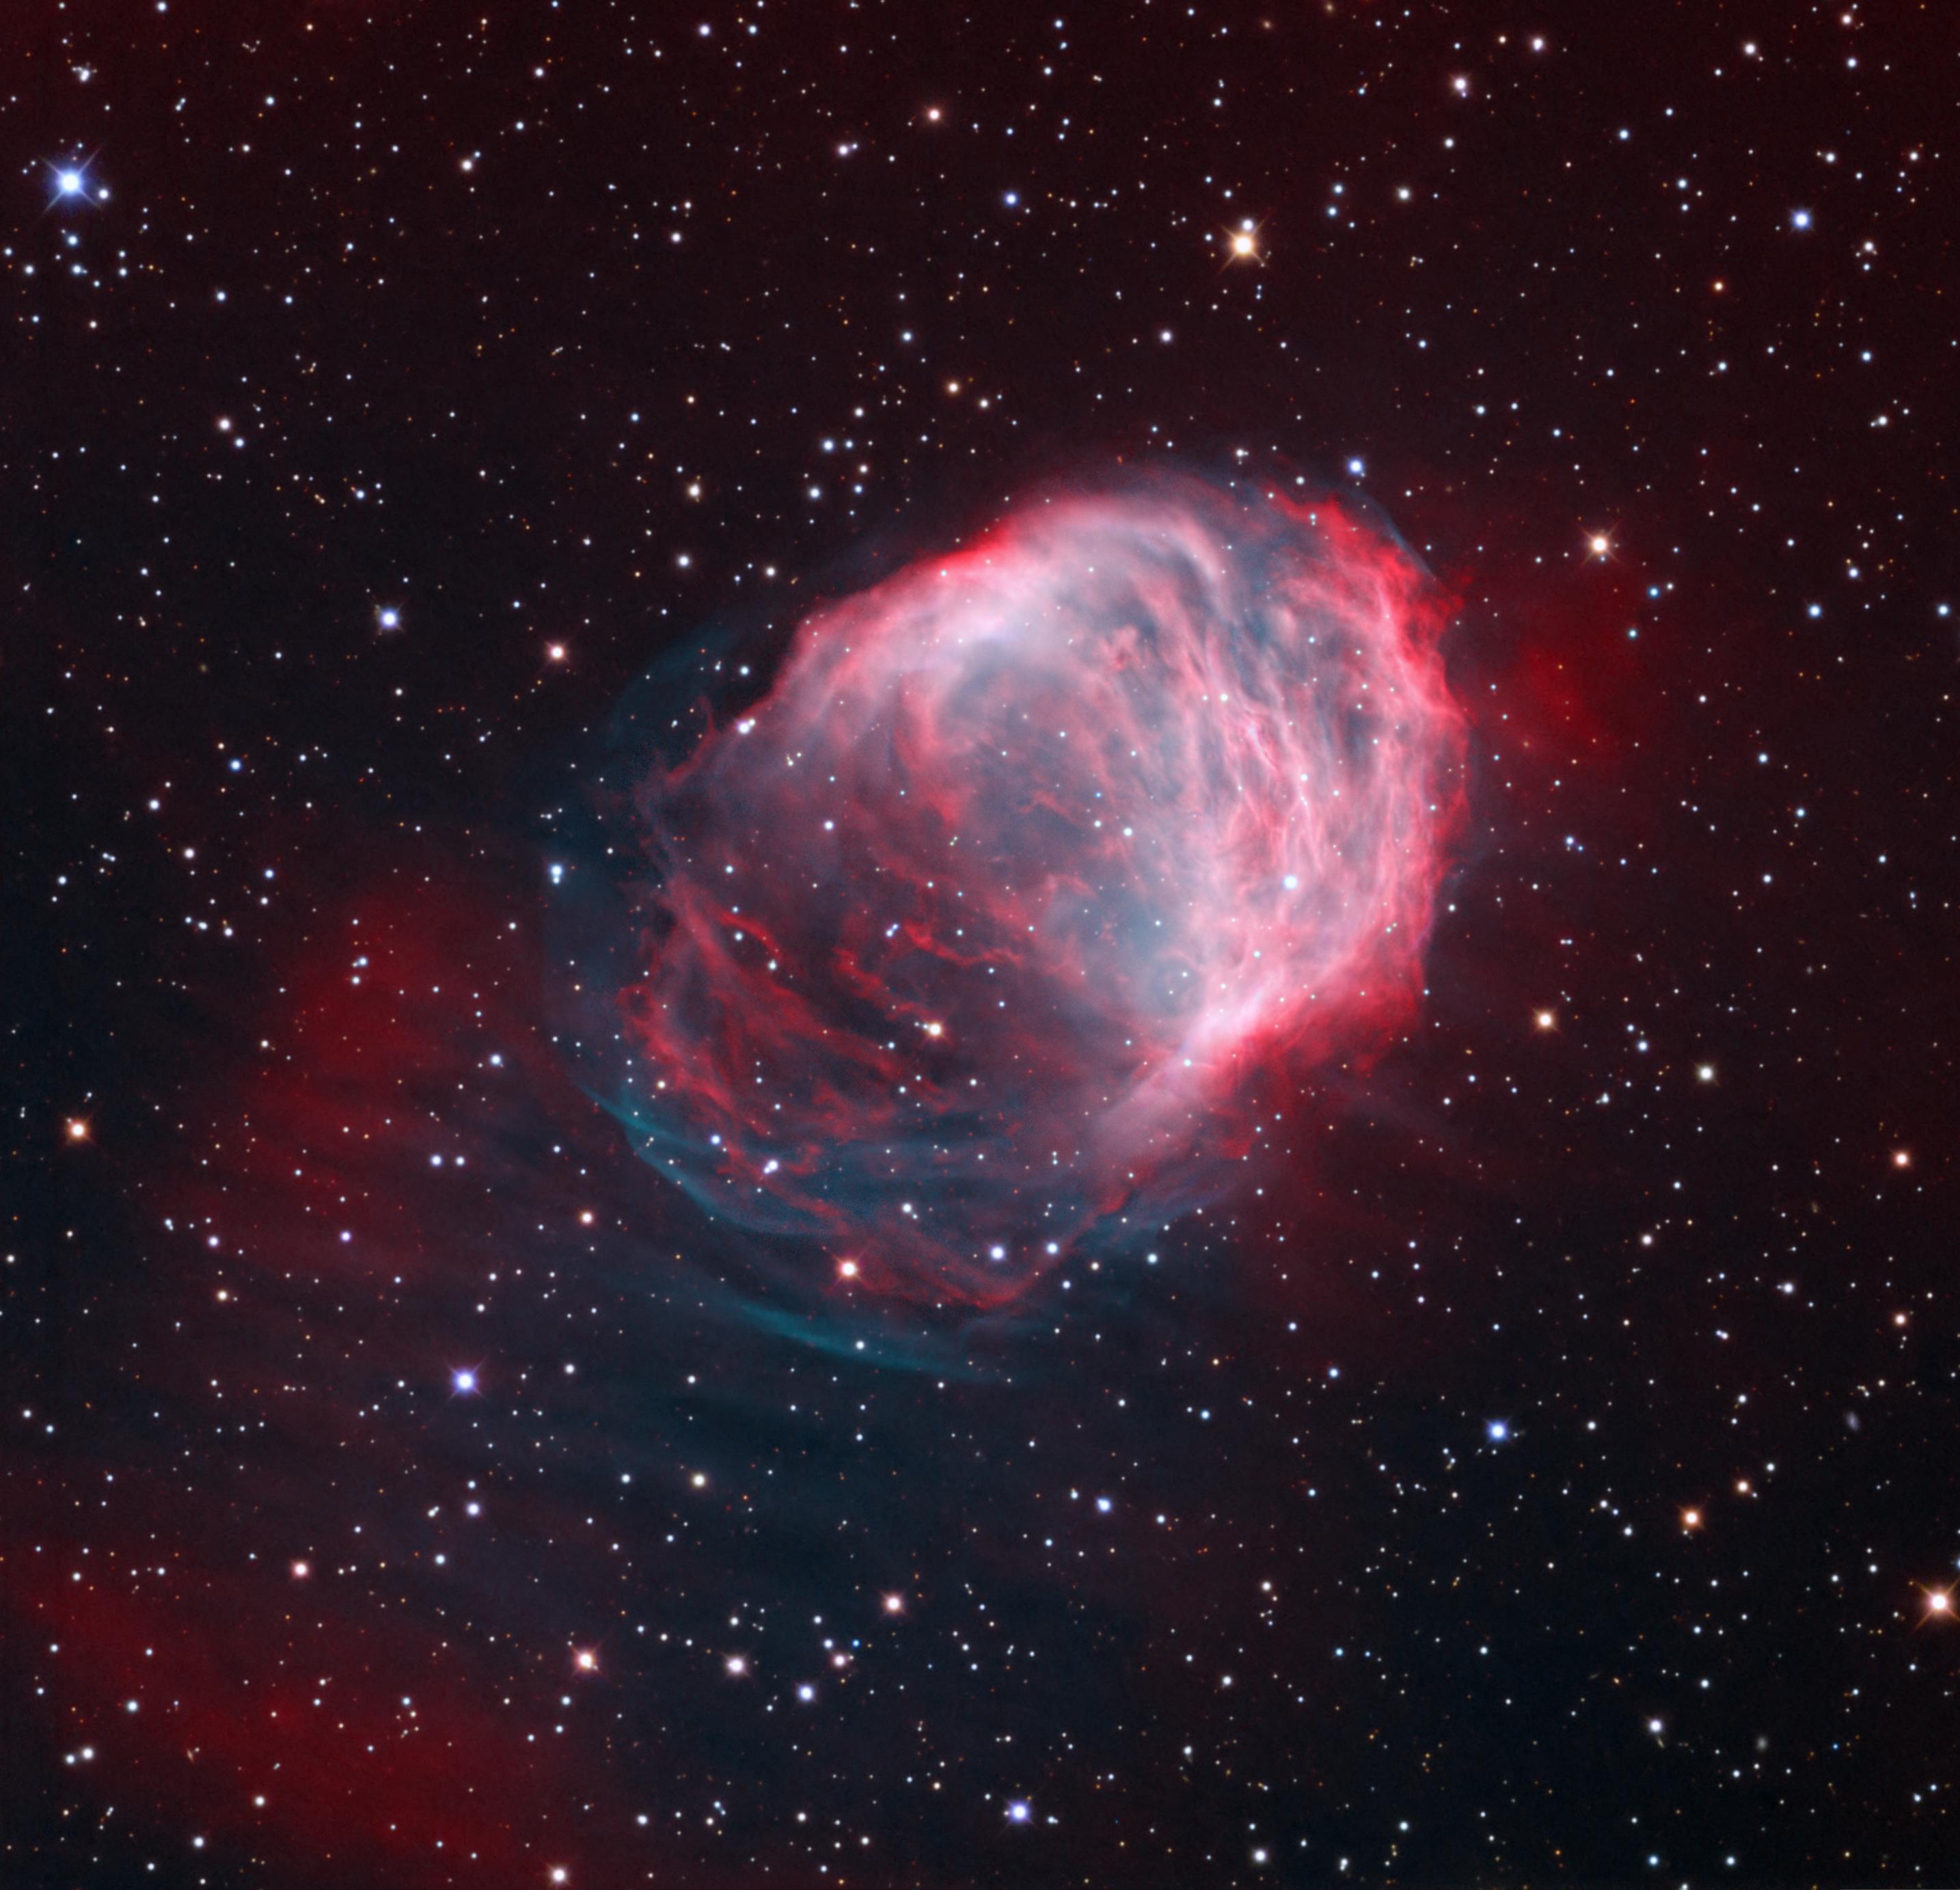 nebula stage of a star - photo #18